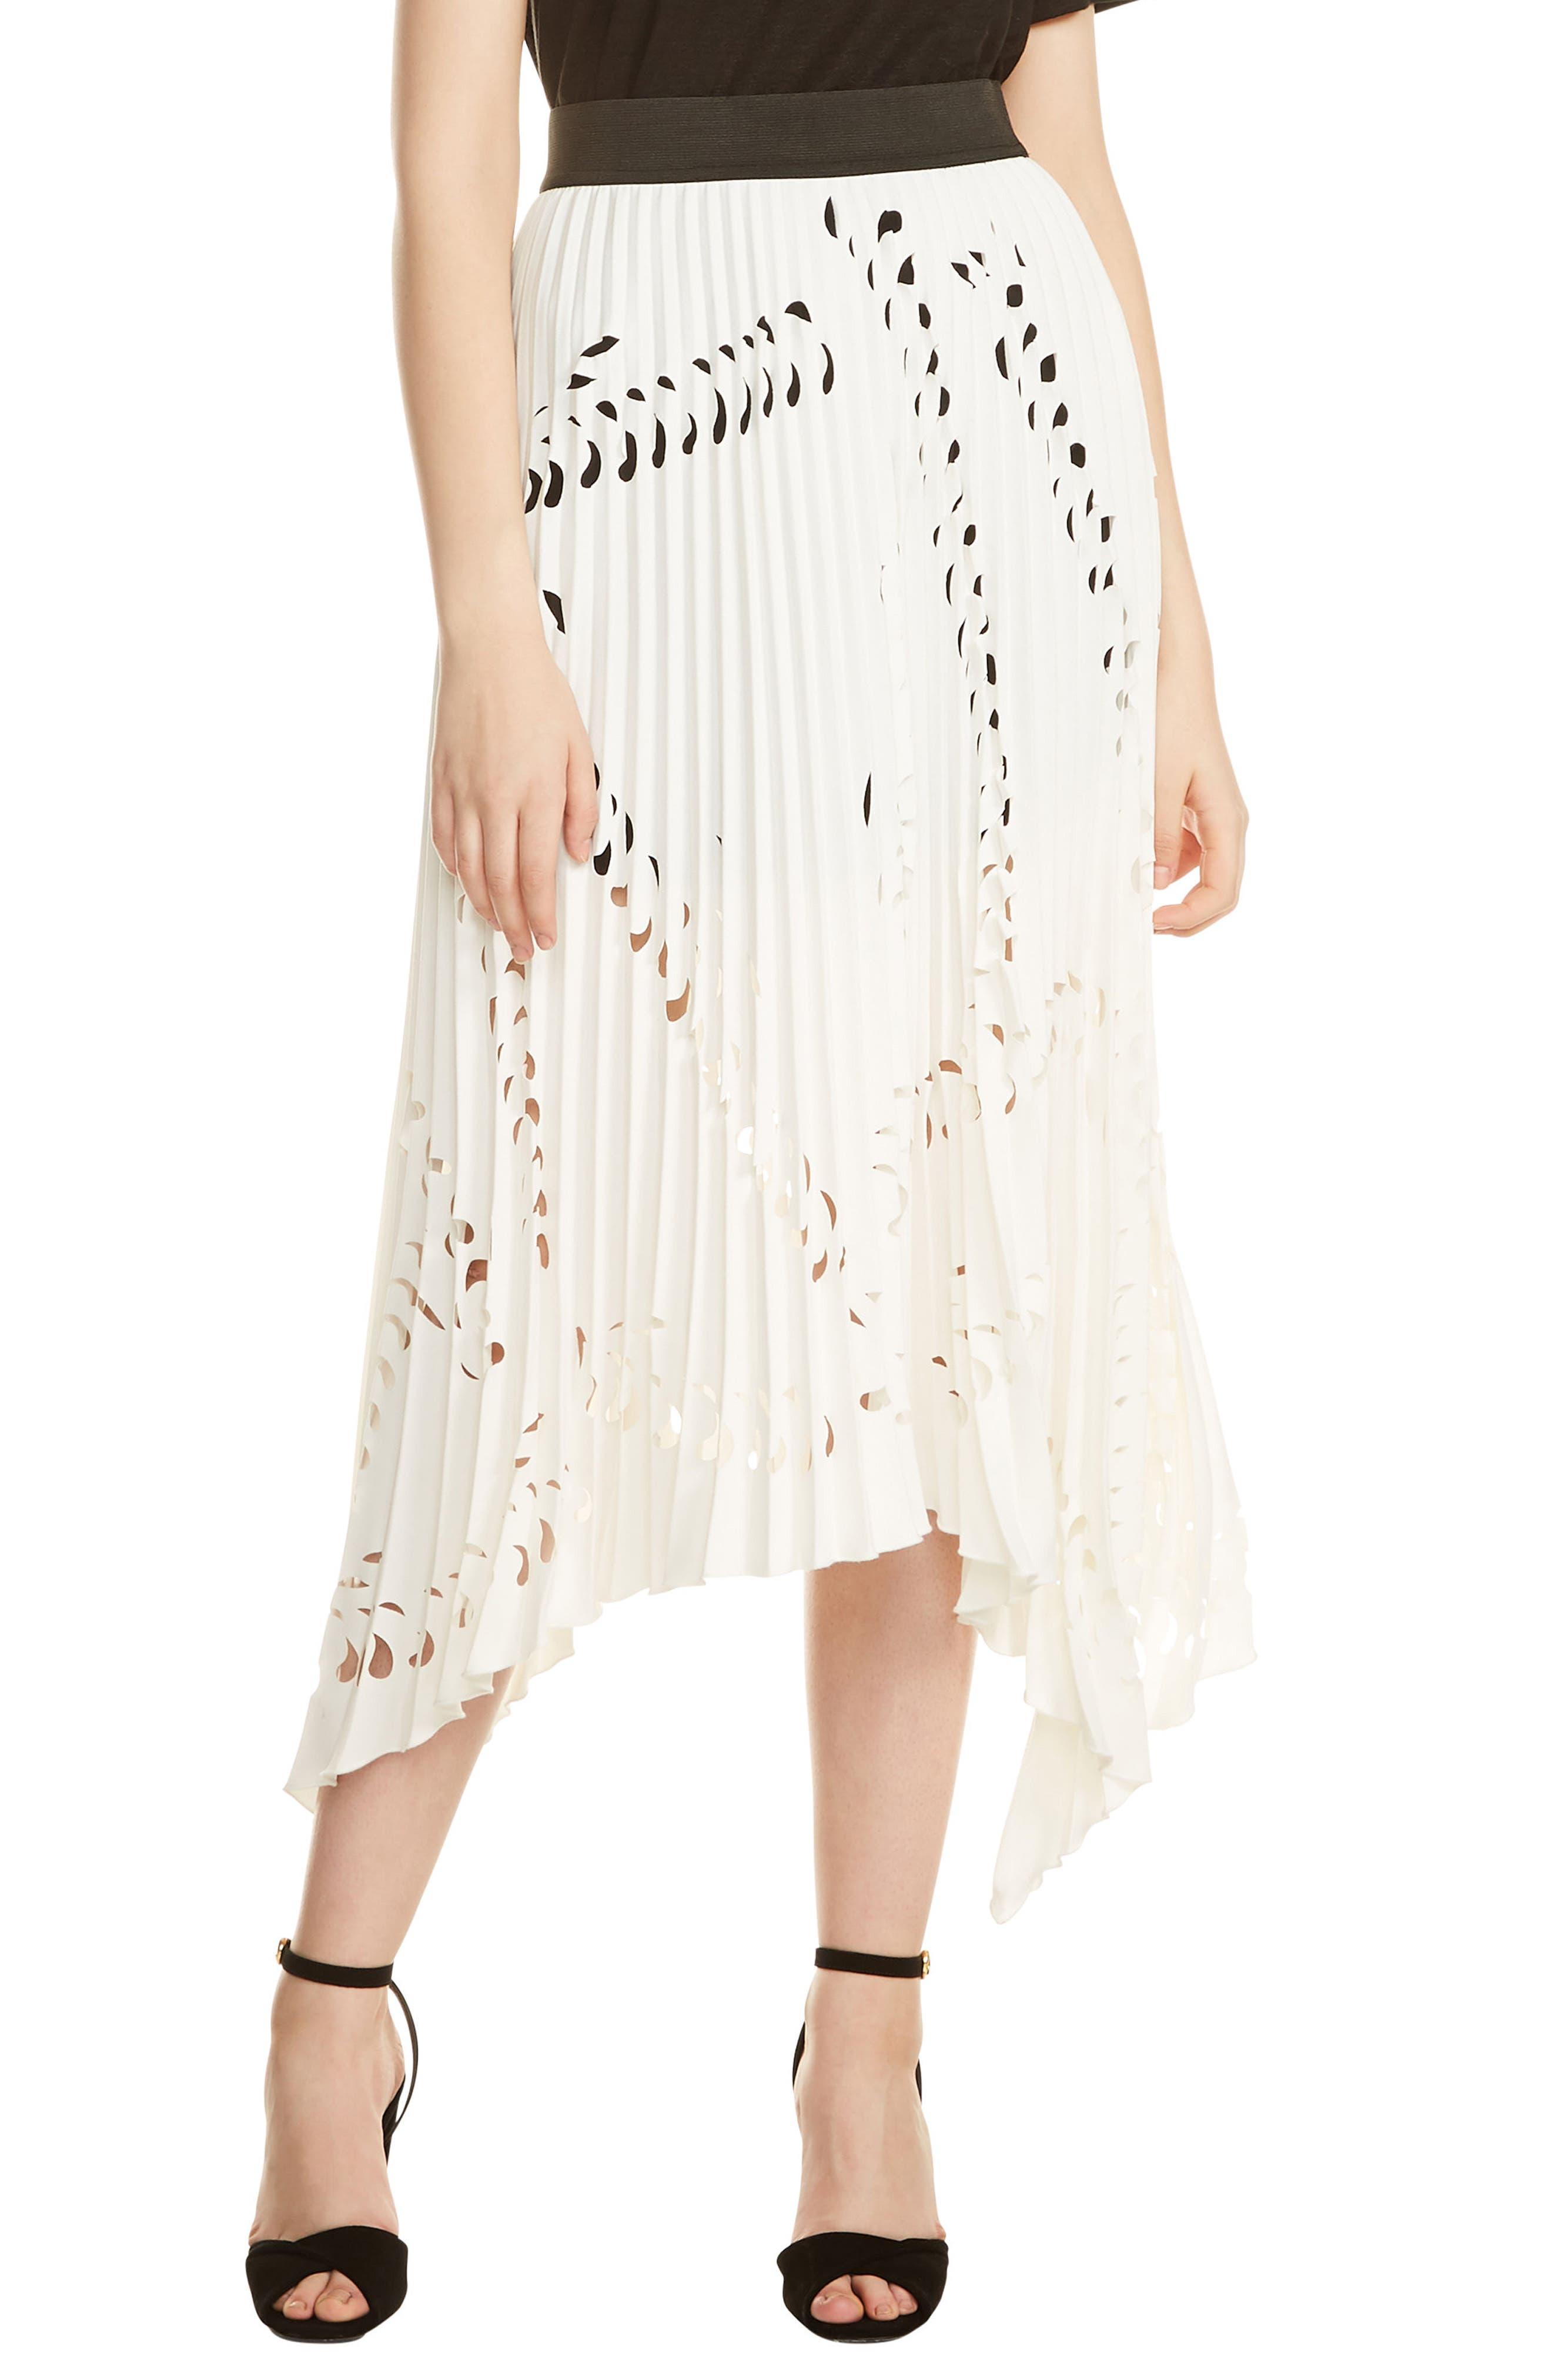 Jeflexe Cutout Pleat Midi Skirt,                         Main,                         color, 100